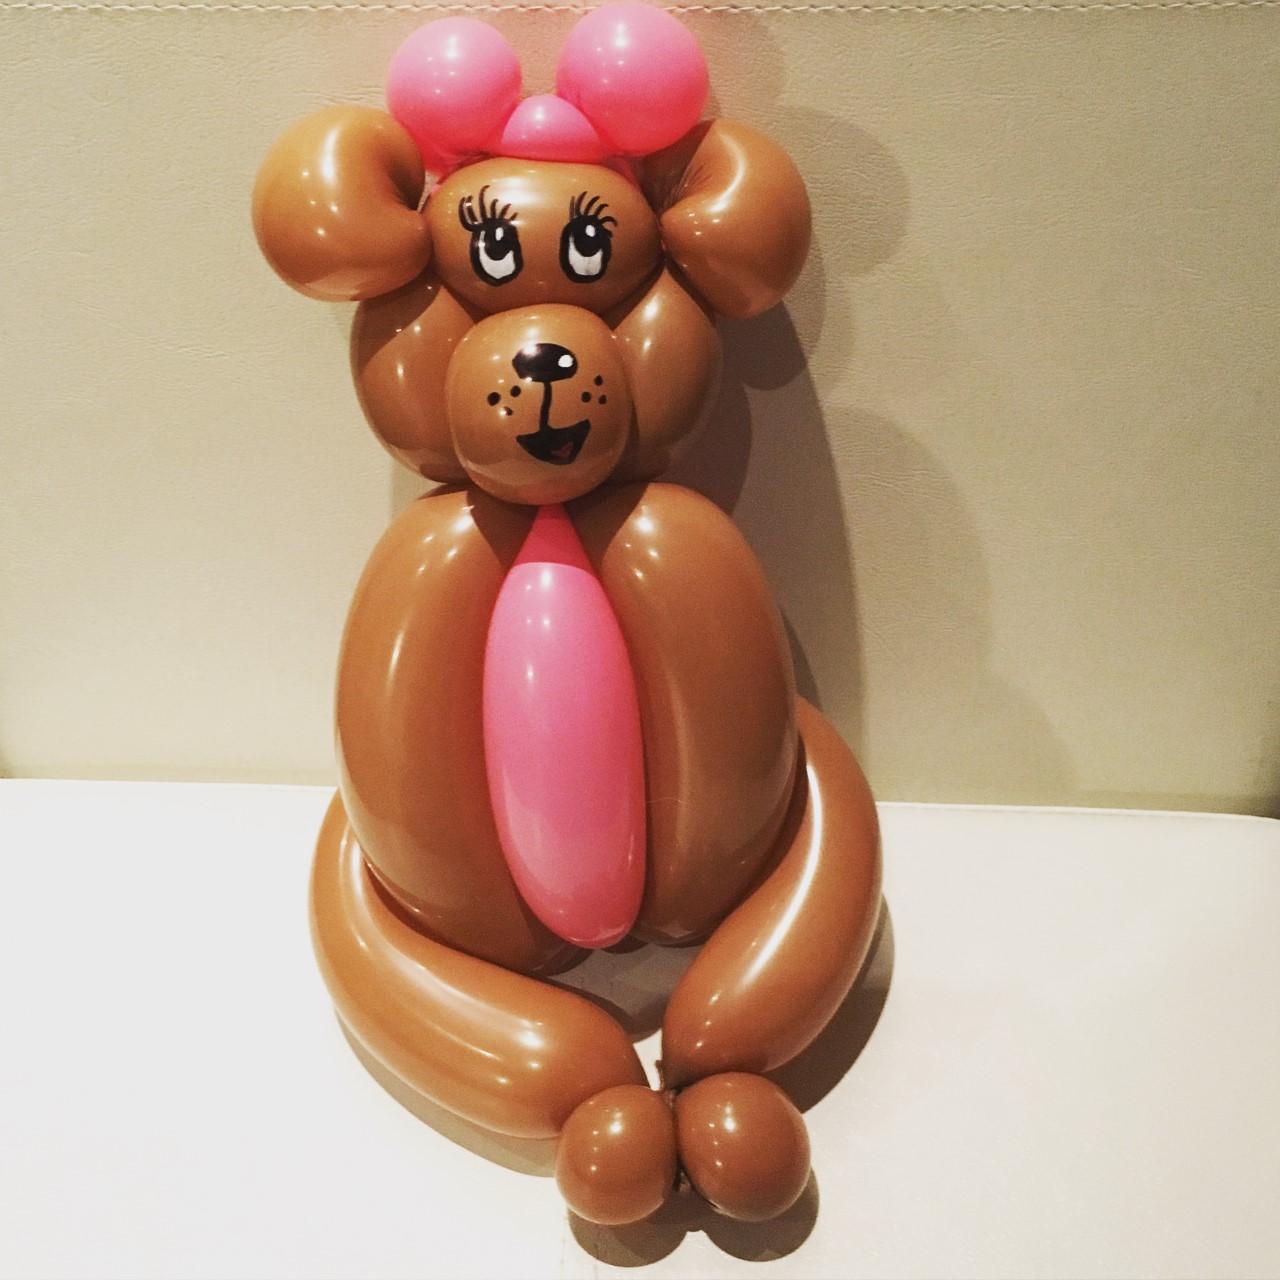 Cute bear balloon animal